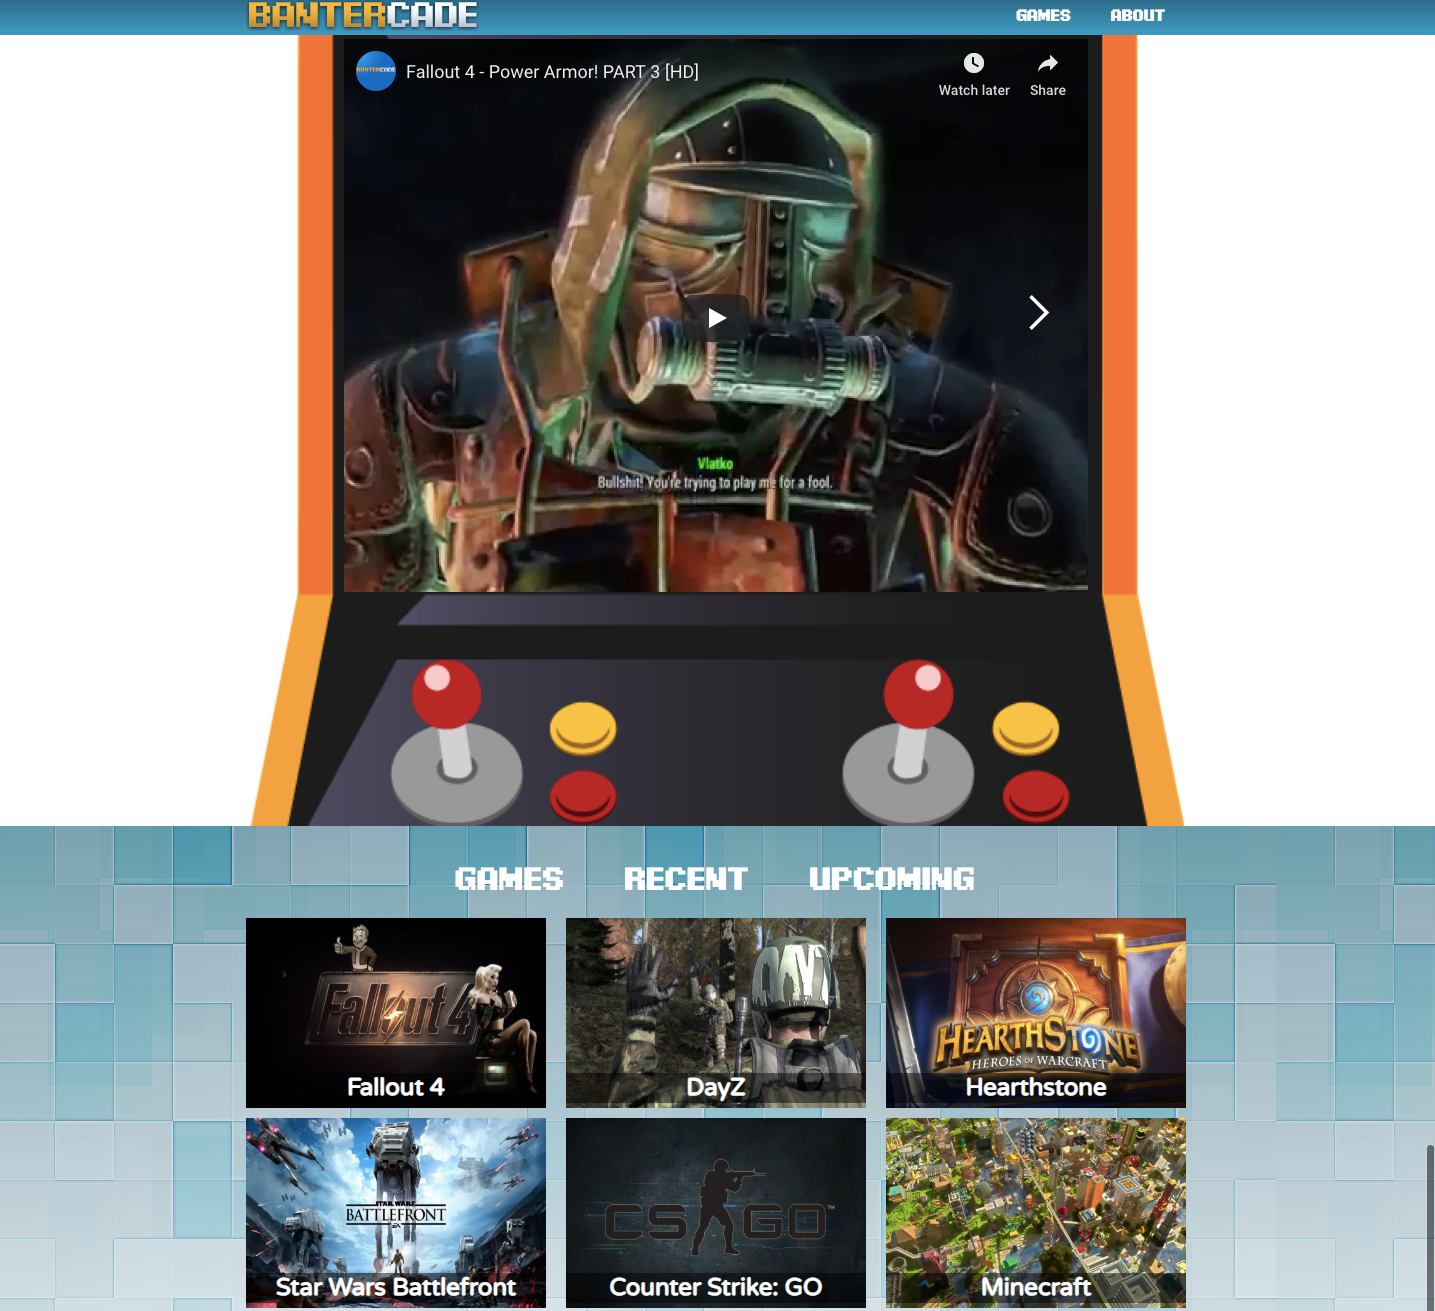 Bantercade homepage.